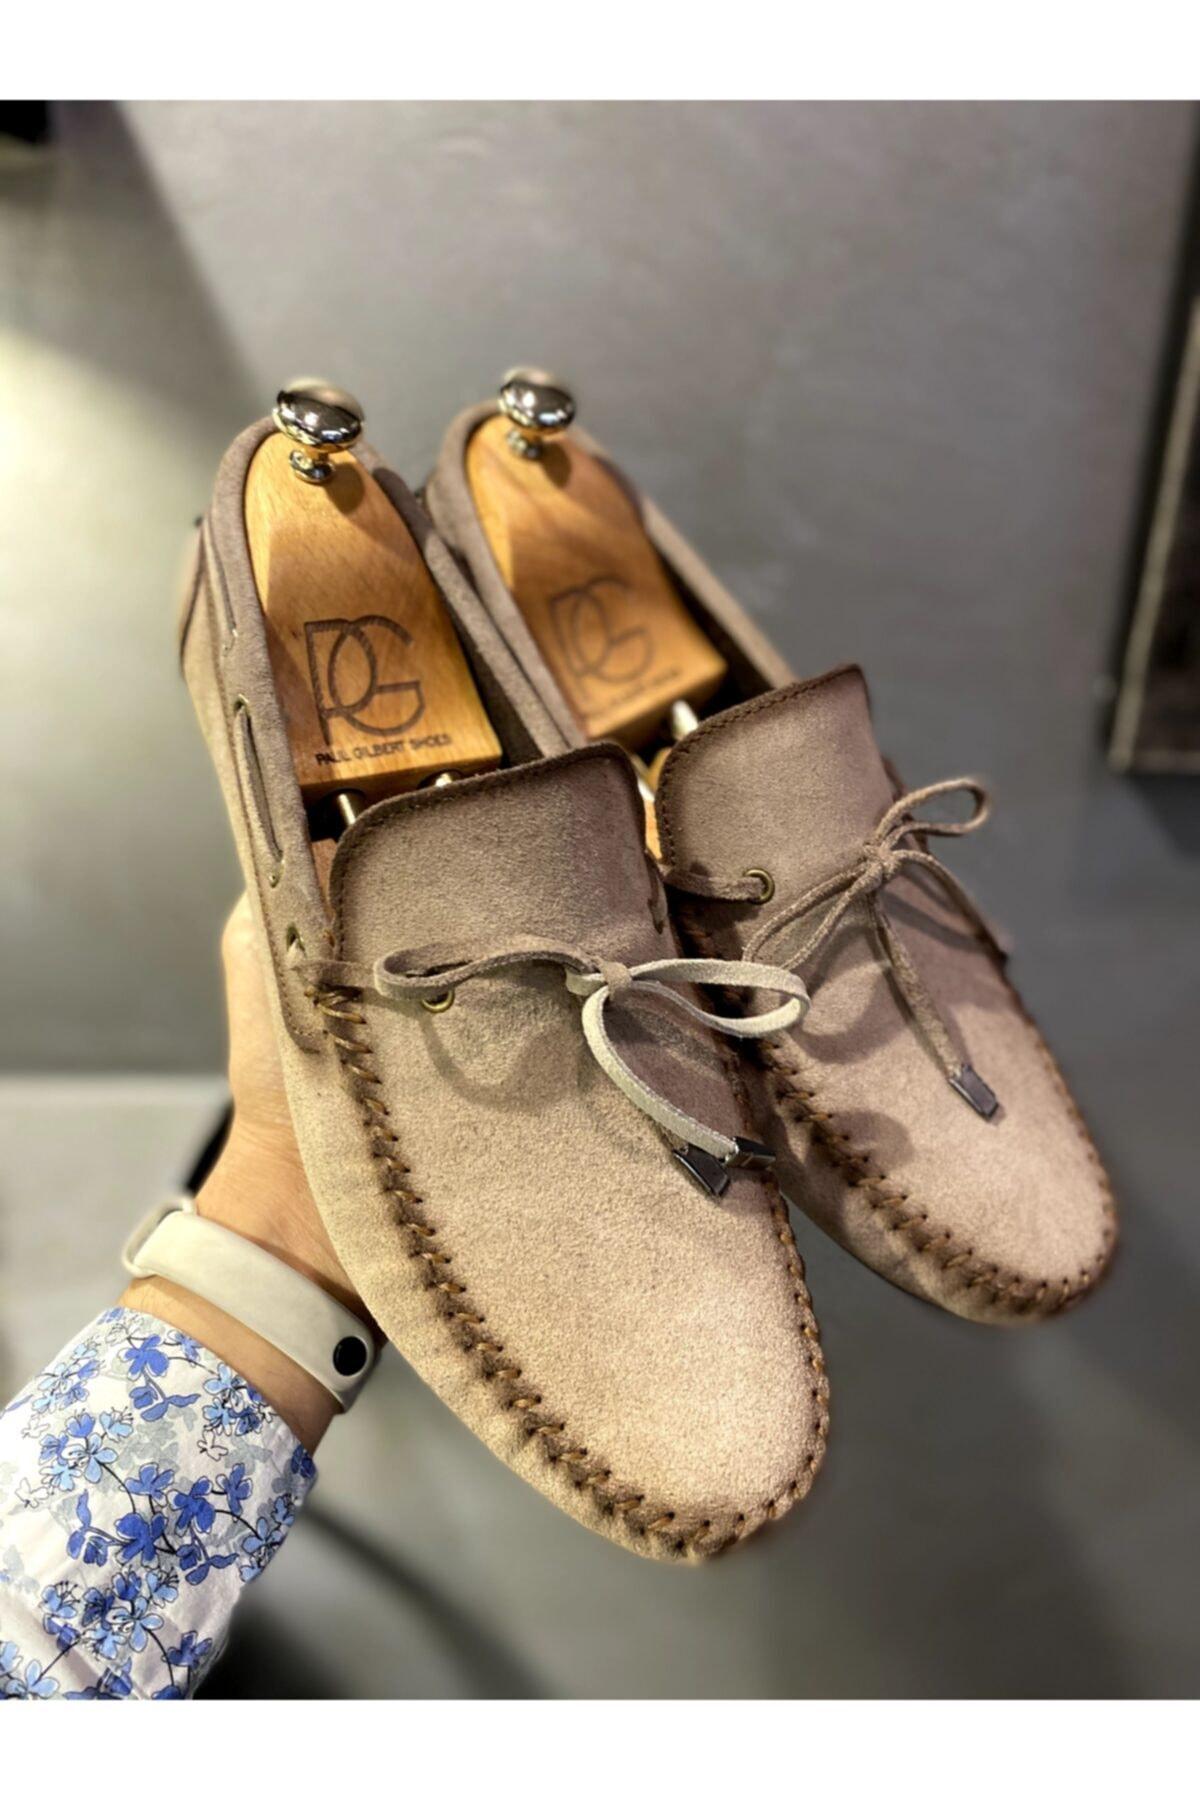 کفش مخکالج 2020 مردانه برند Treyler Ayakkabı رنگ بژ کد ty107911391